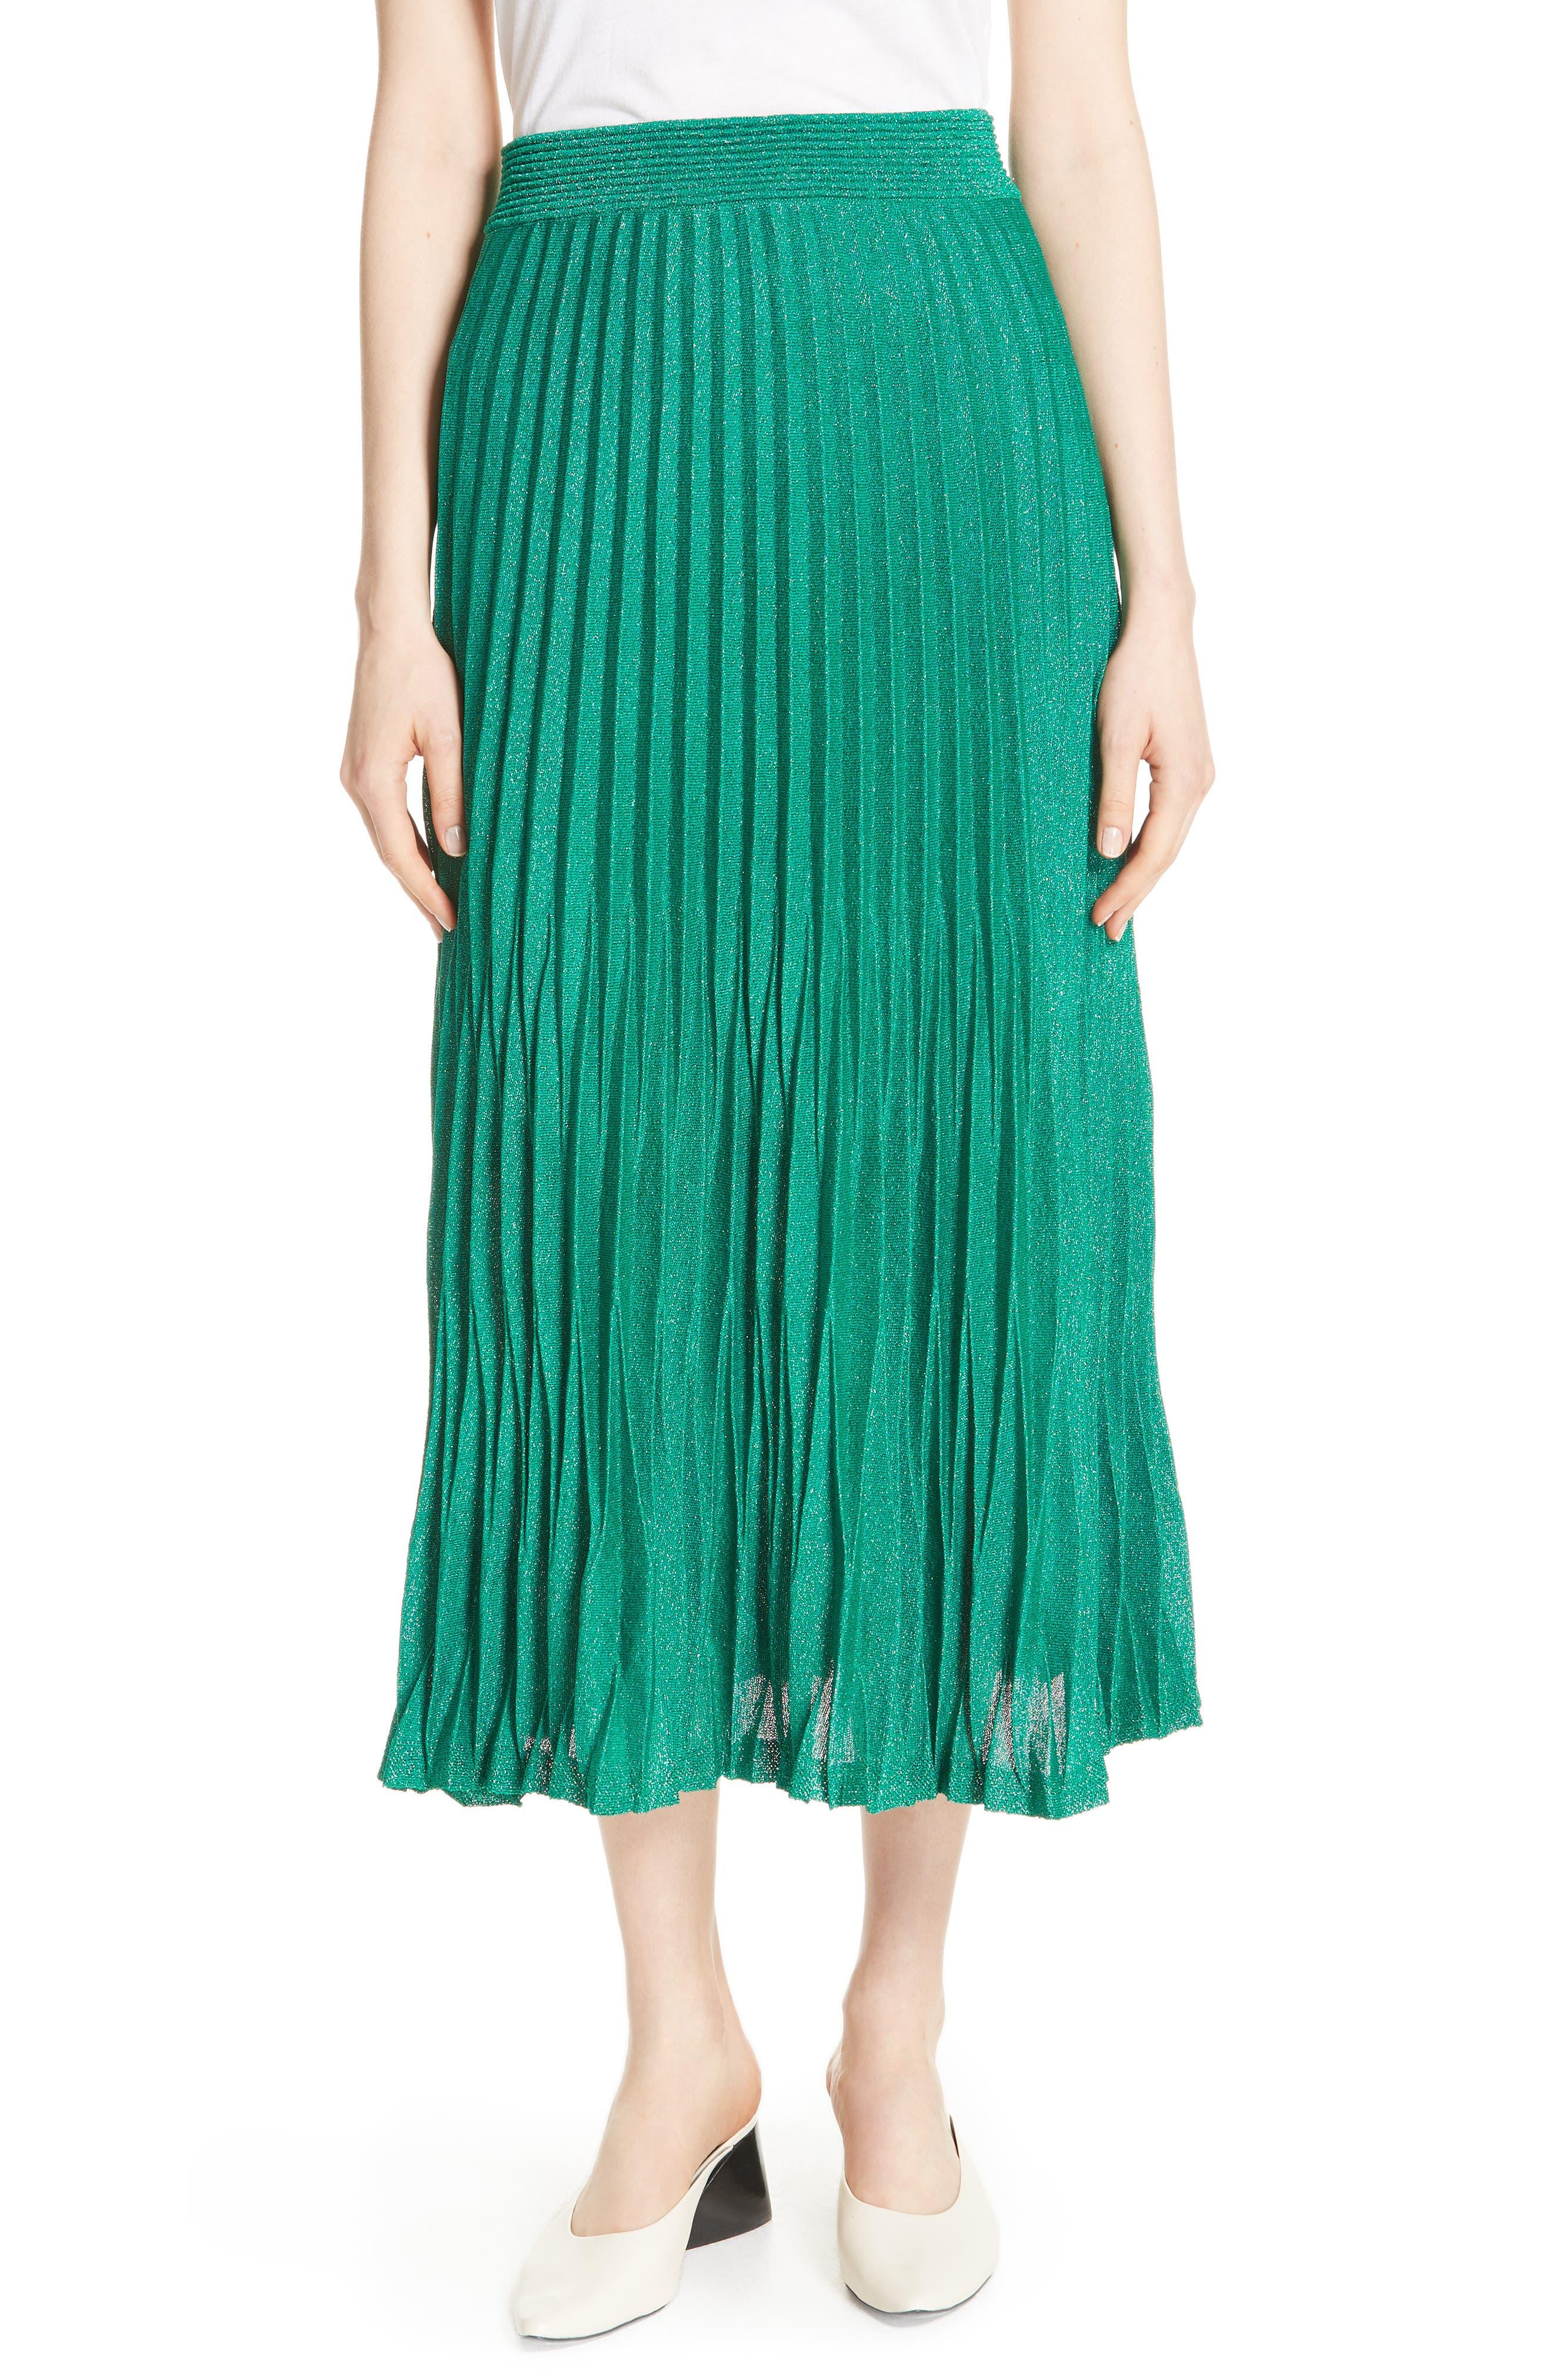 Jupette Pleated Midi Skirt,                         Main,                         color, Green